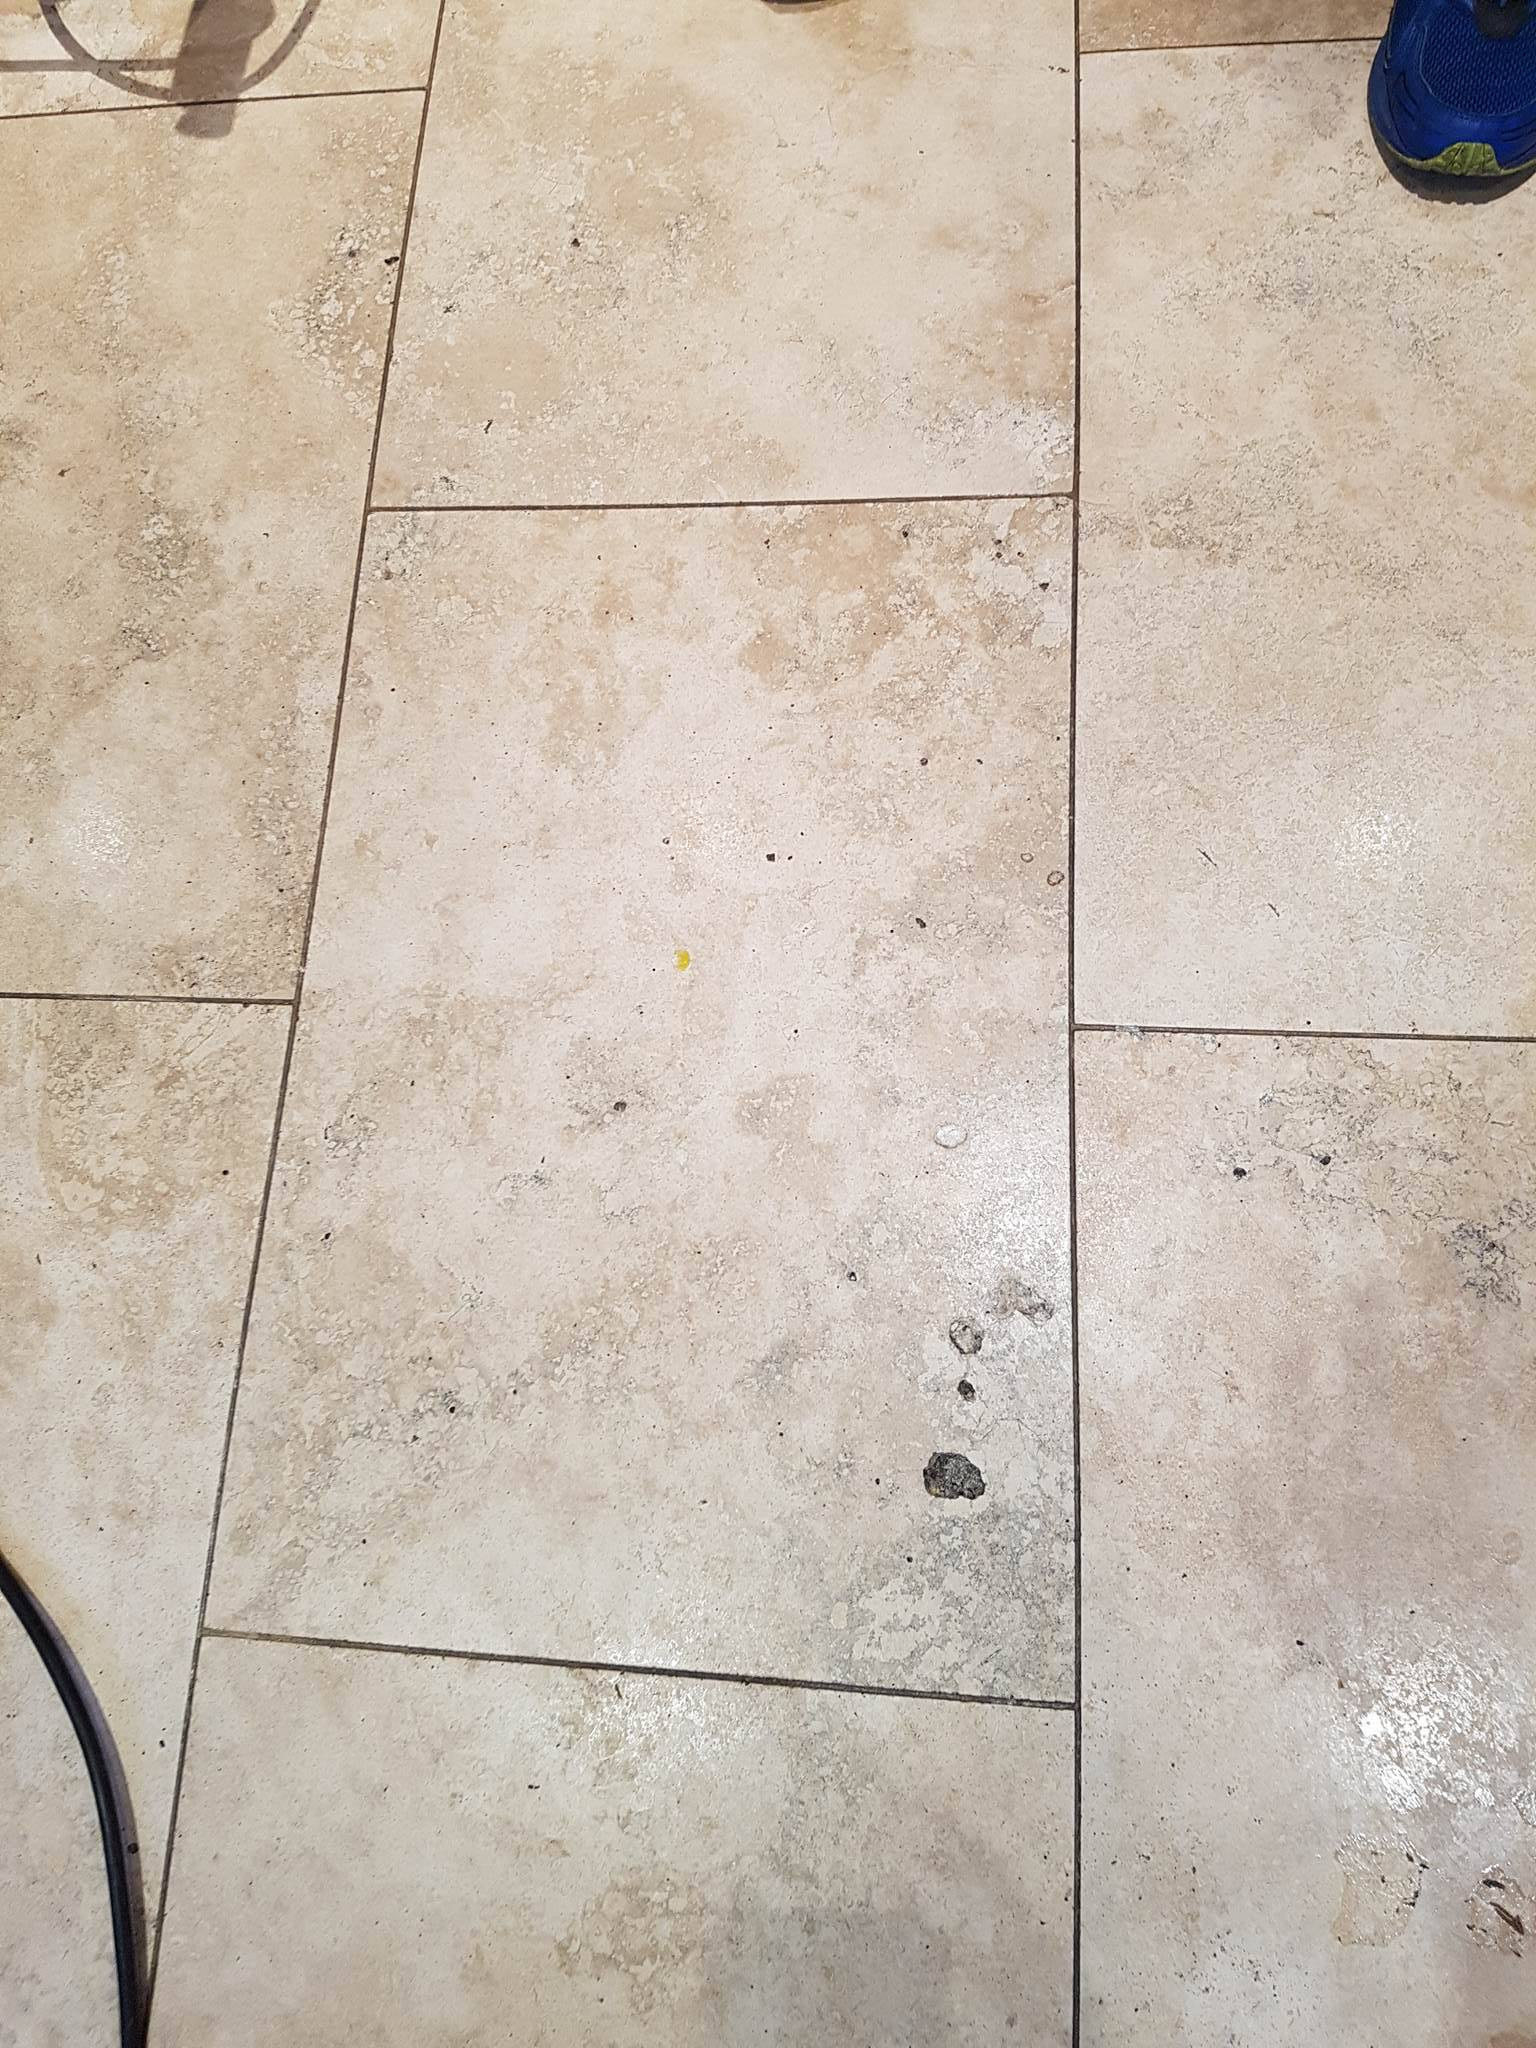 Removing Wax And Polishing Travertine